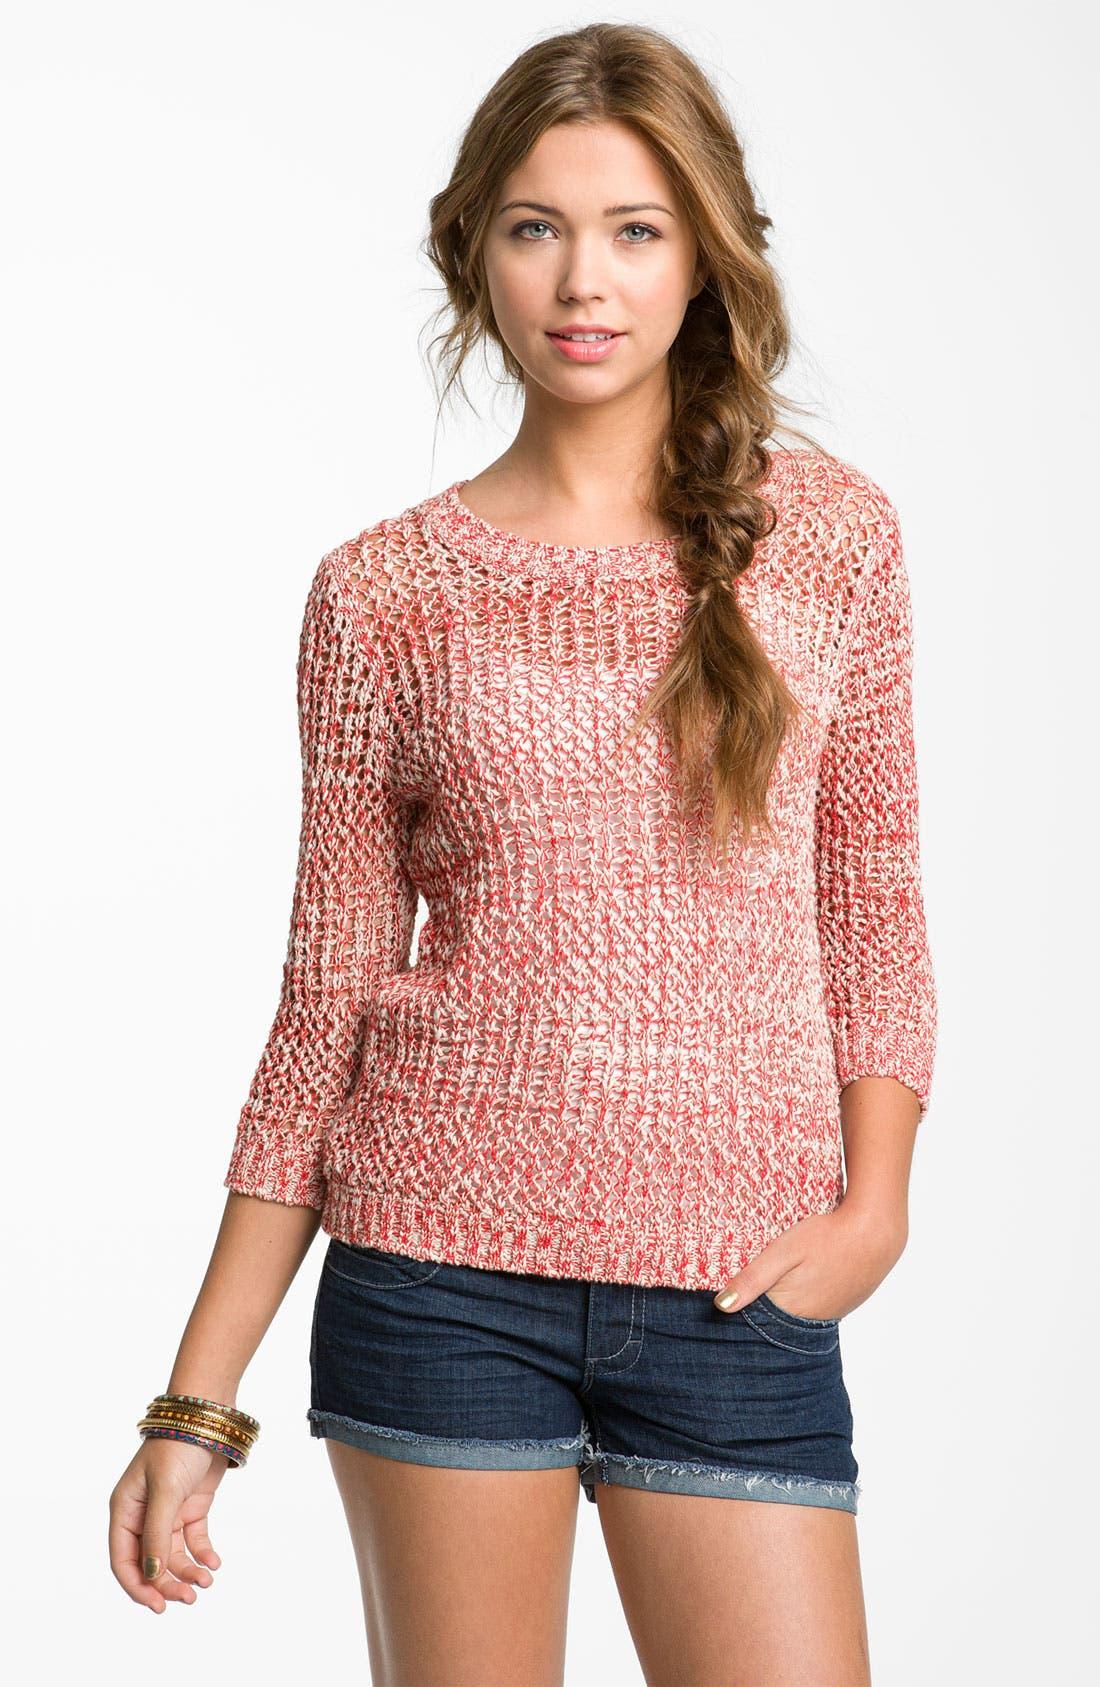 Alternate Image 1 Selected - Rubbish® Marled Knit Sweater (Juniors)